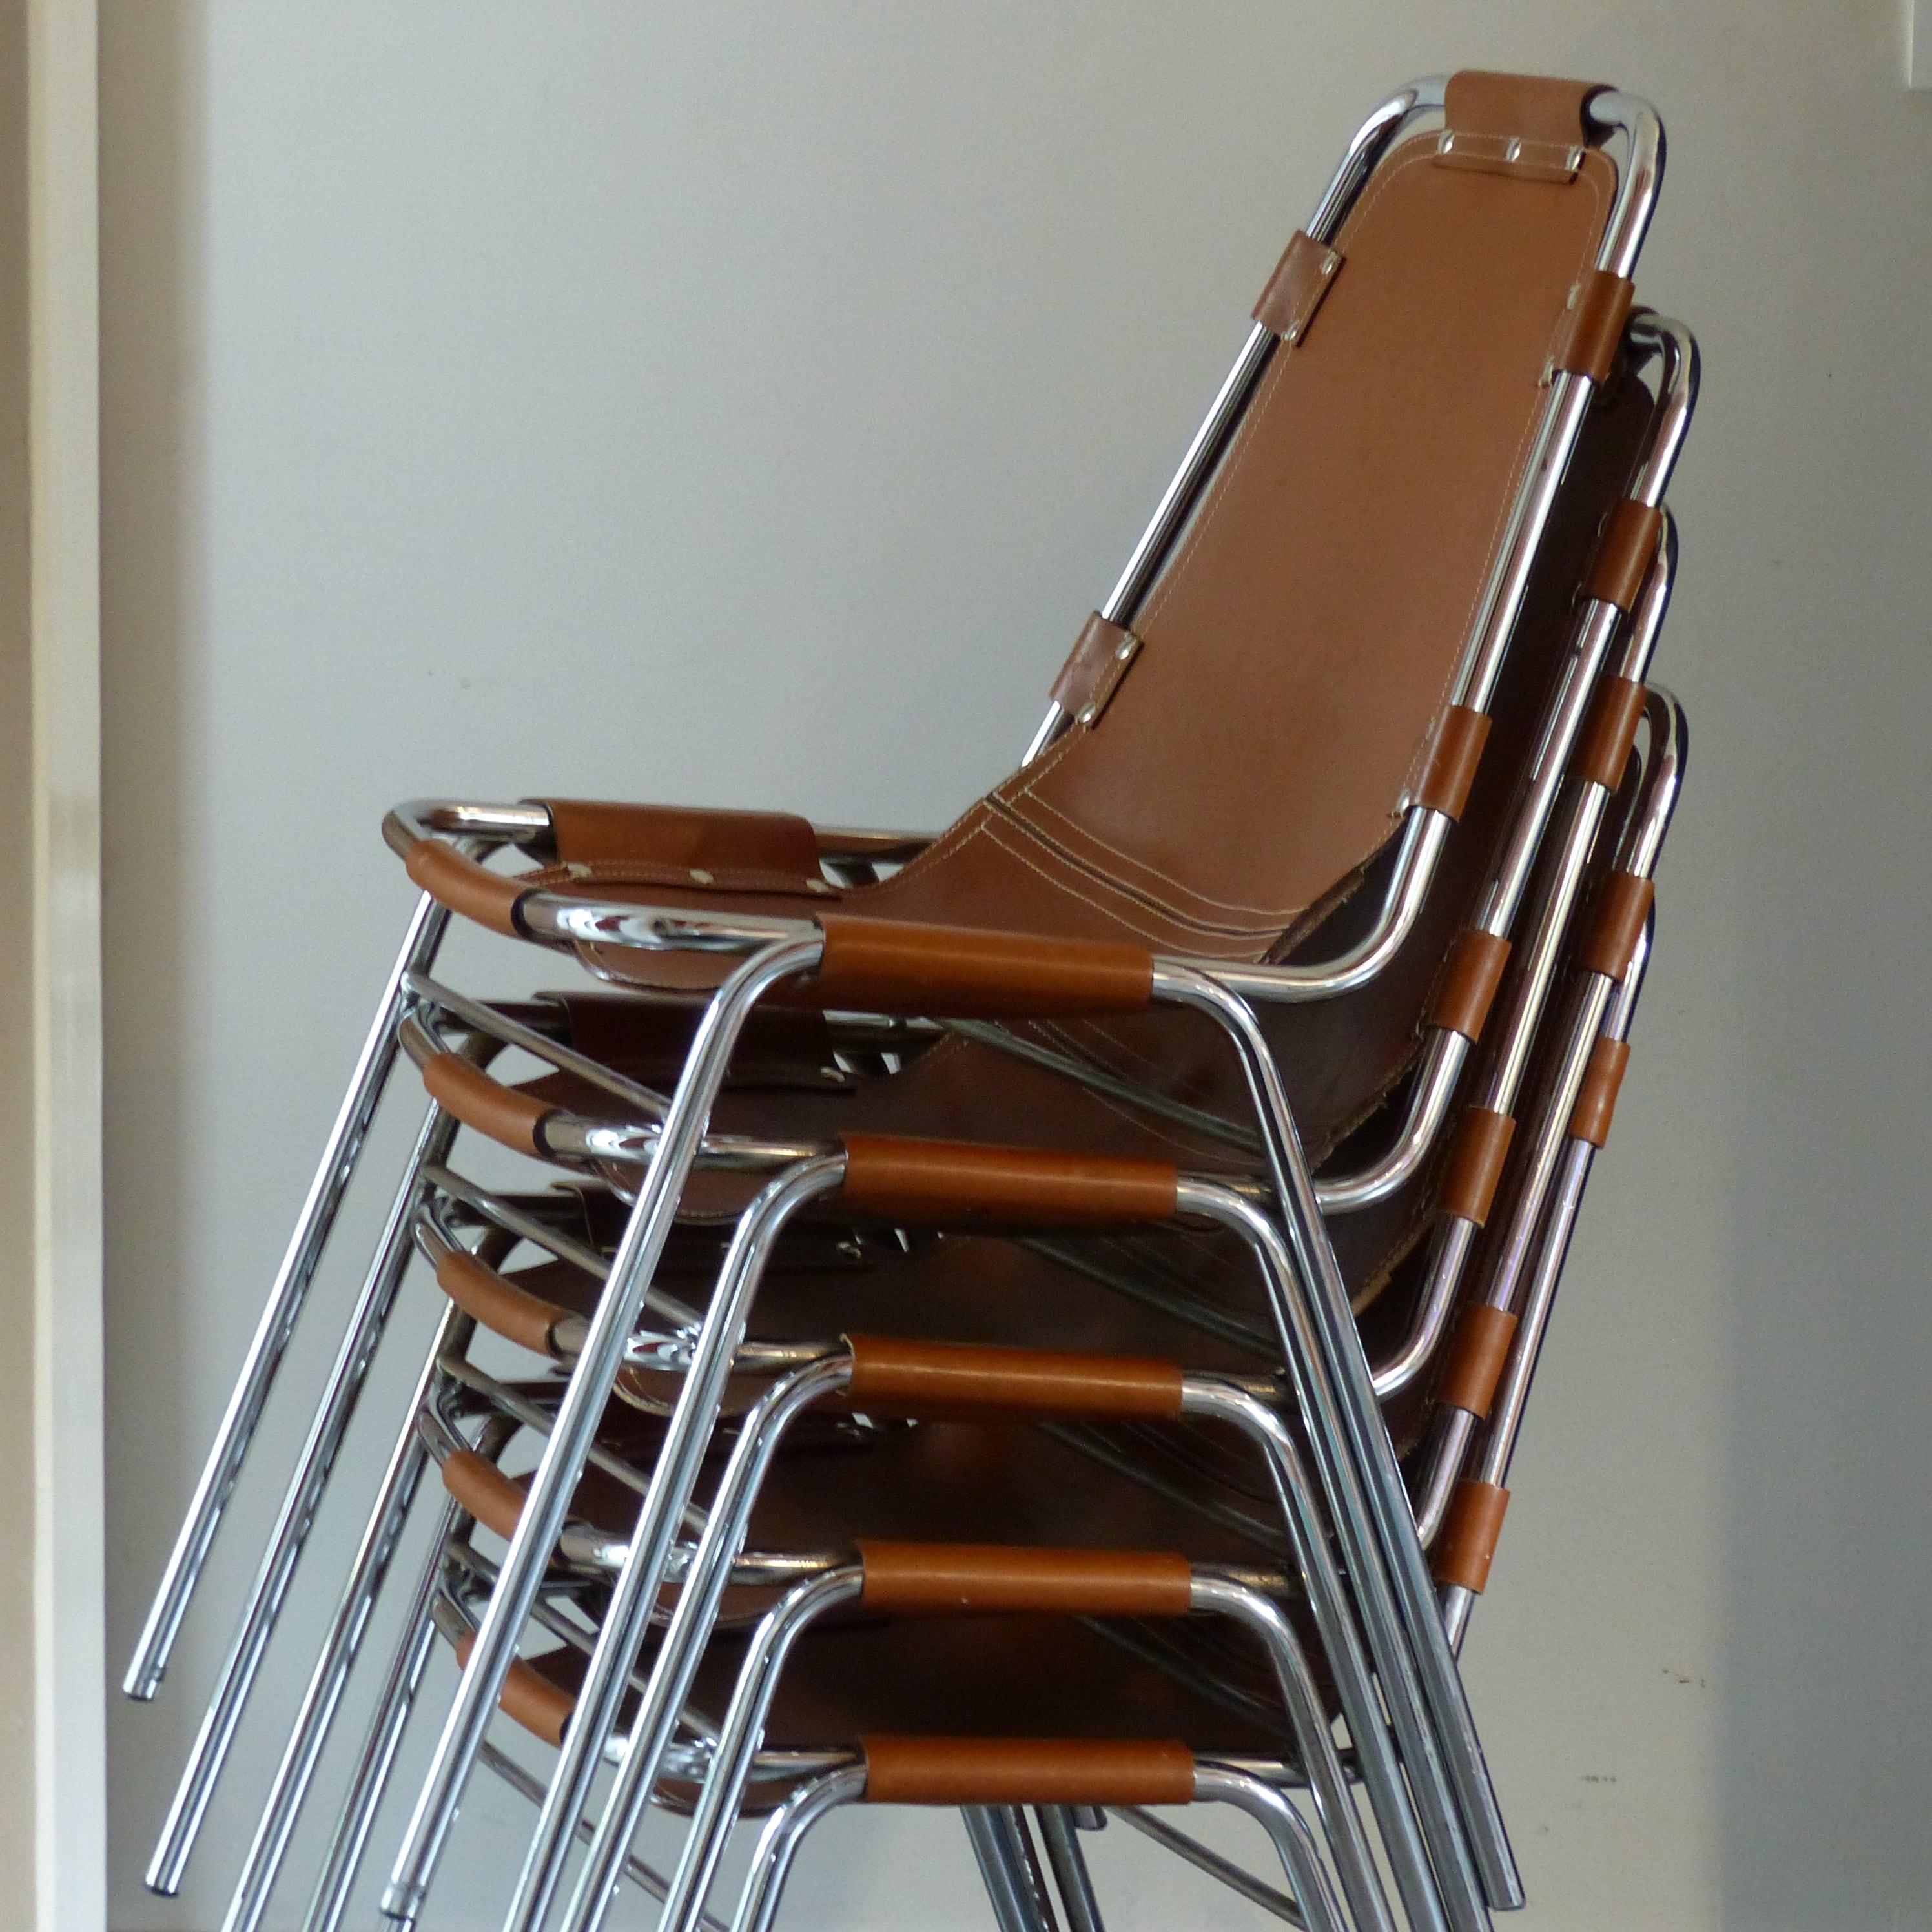 chaise les arcs charlotte perriand 4 dispo lignedebrocante brocante en ligne chine pour. Black Bedroom Furniture Sets. Home Design Ideas